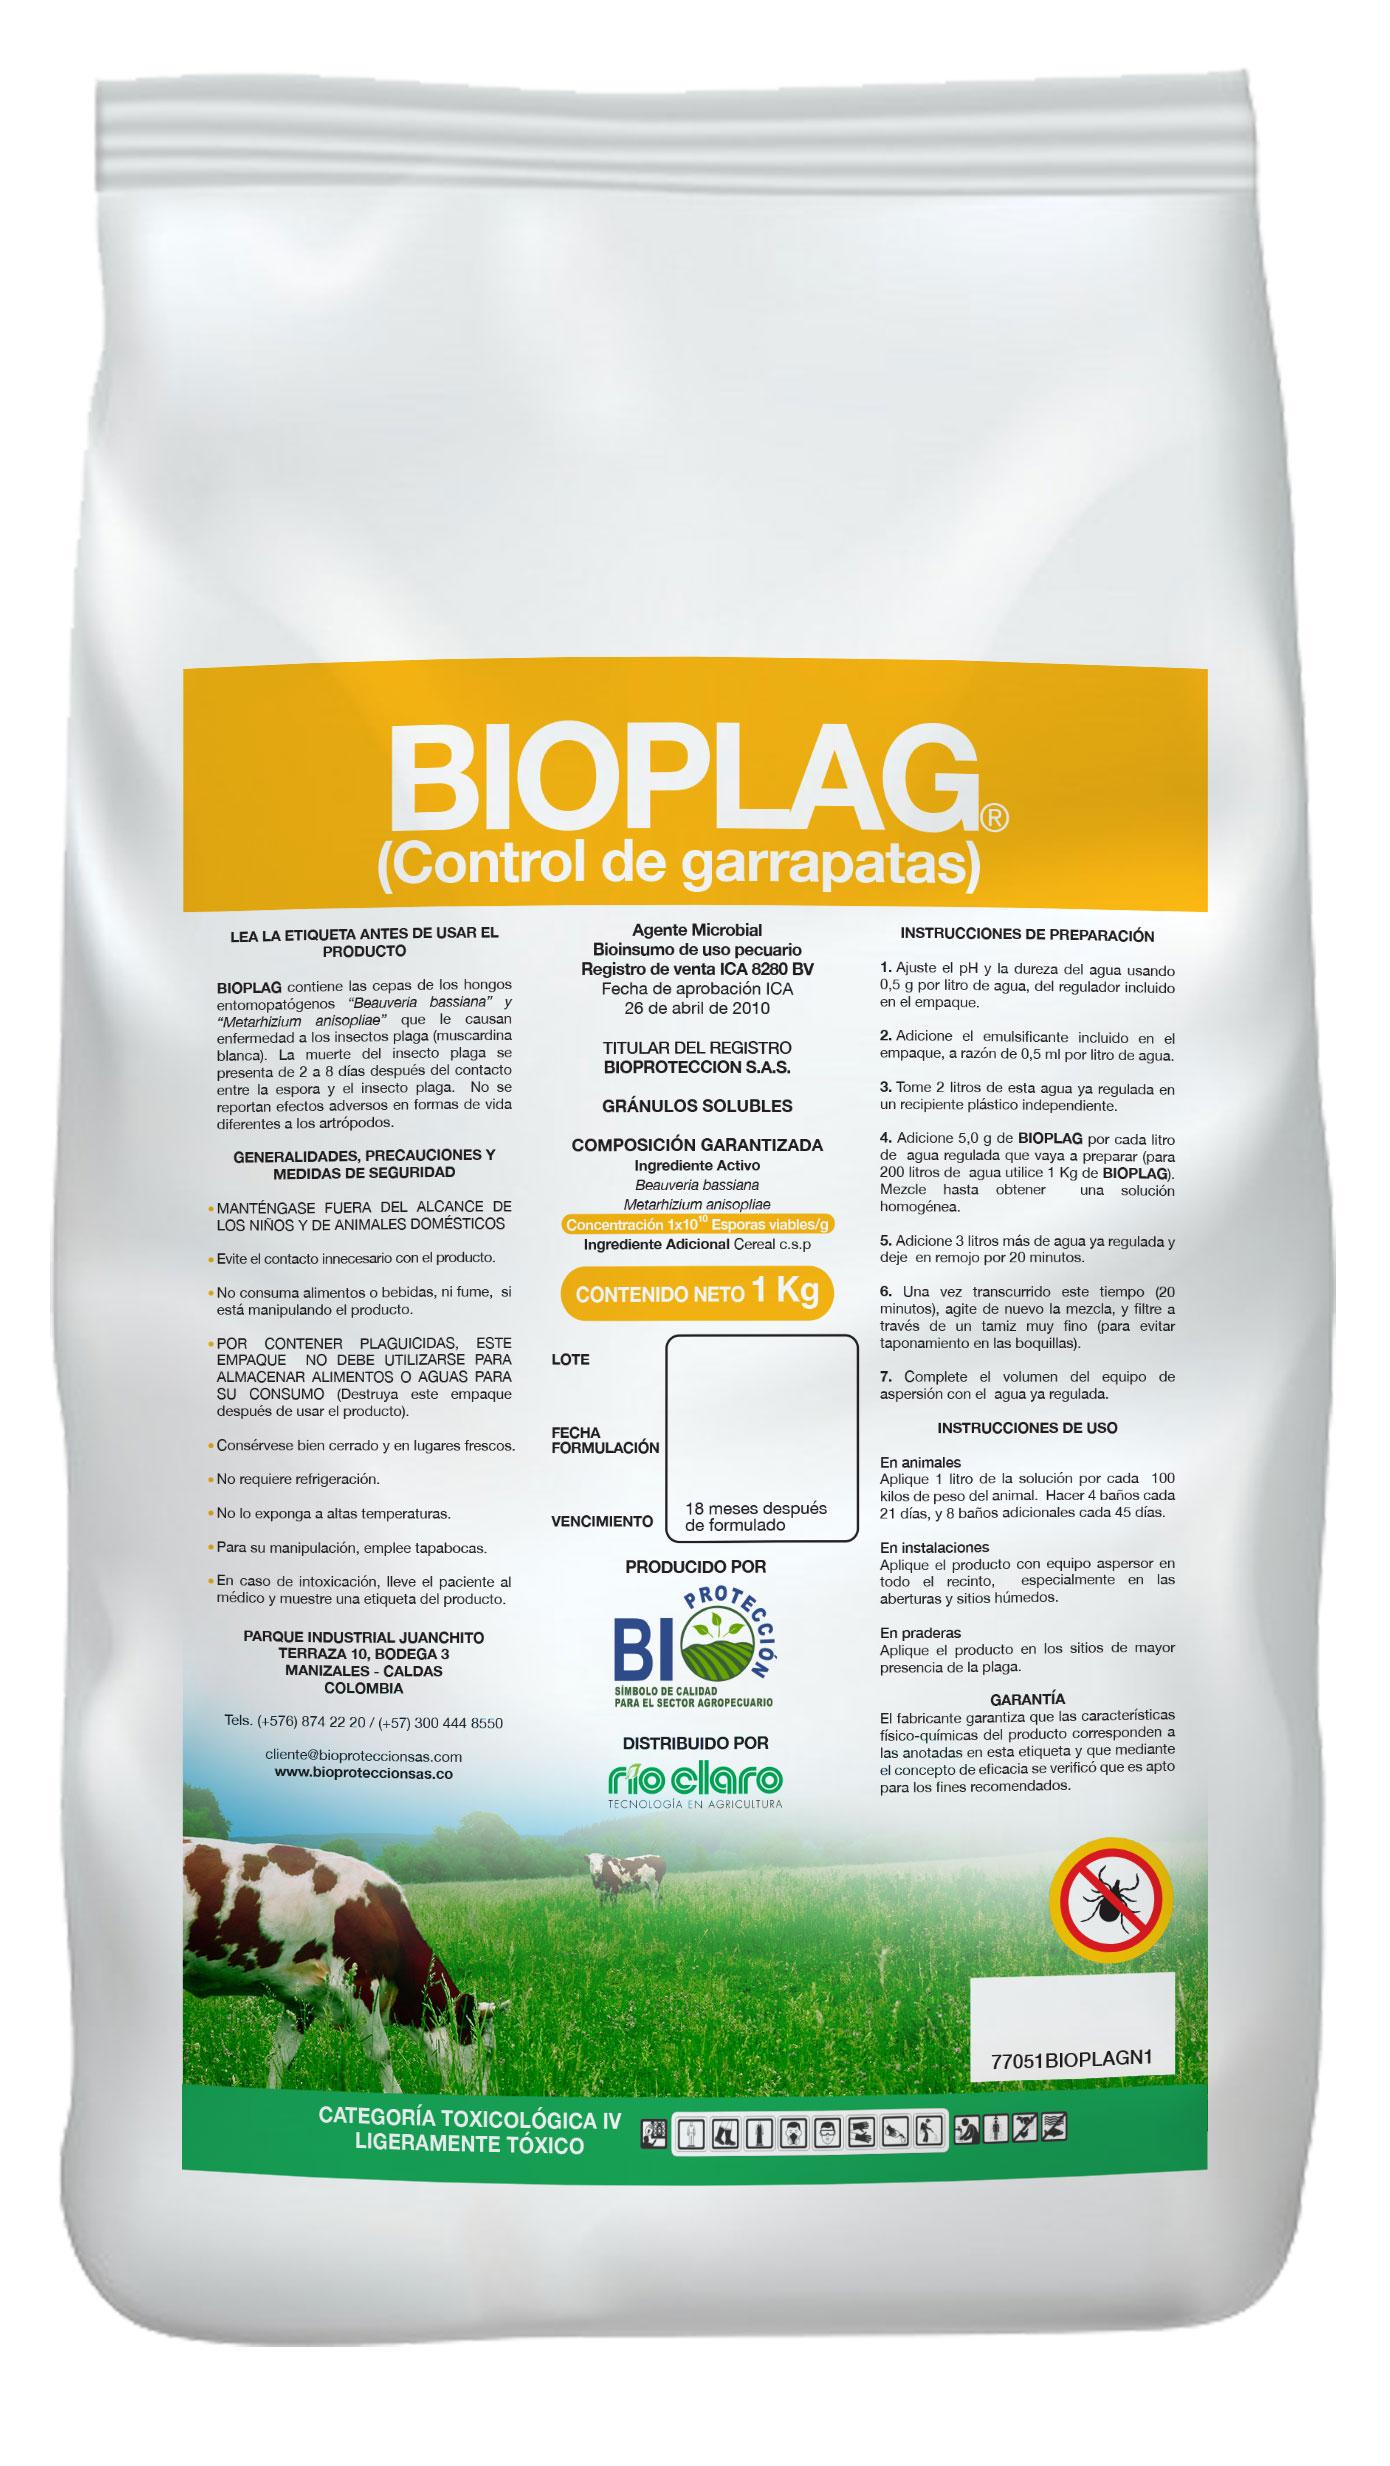 Bioplag